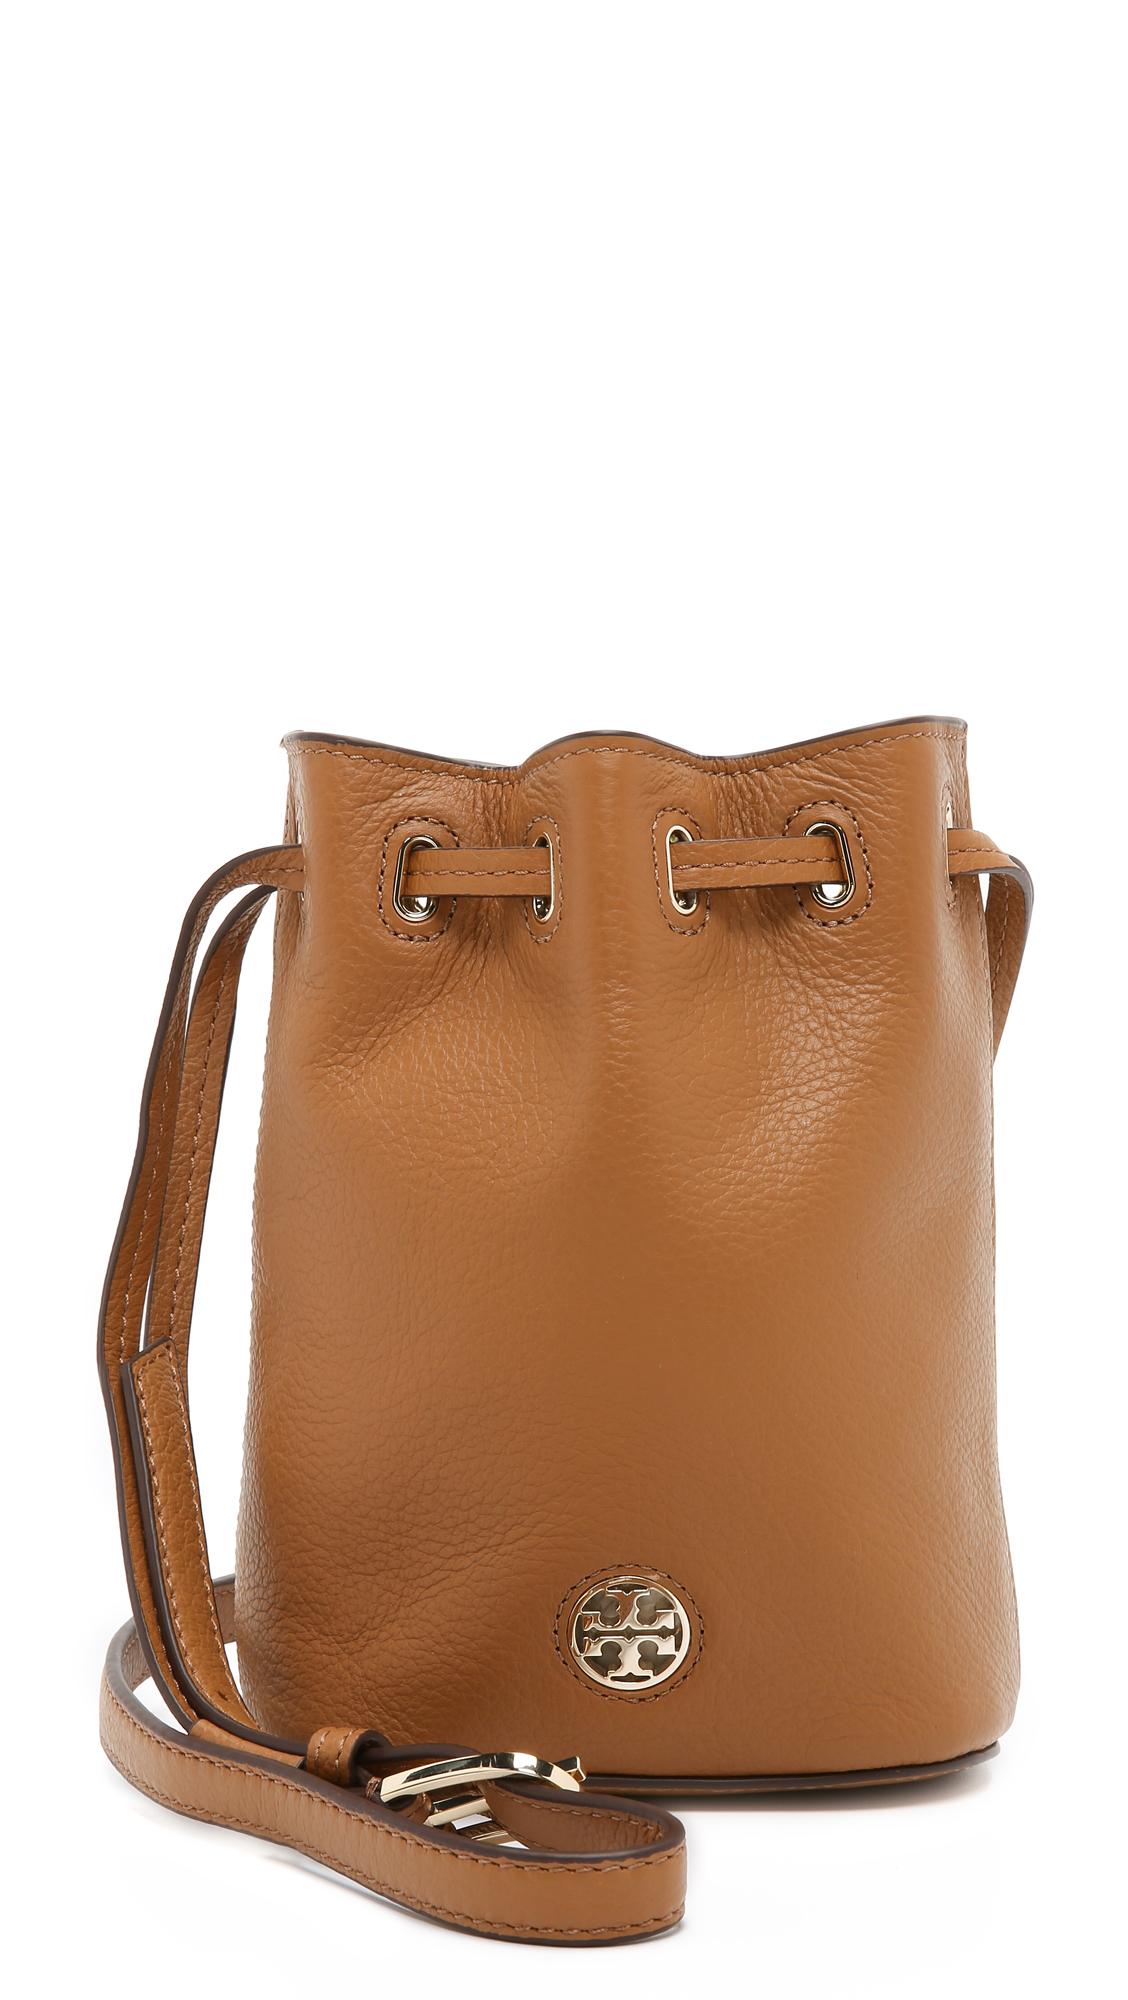 48f3913e1bad Tory Burch Brody Mini Bucket Bag - Bark in Brown - Lyst